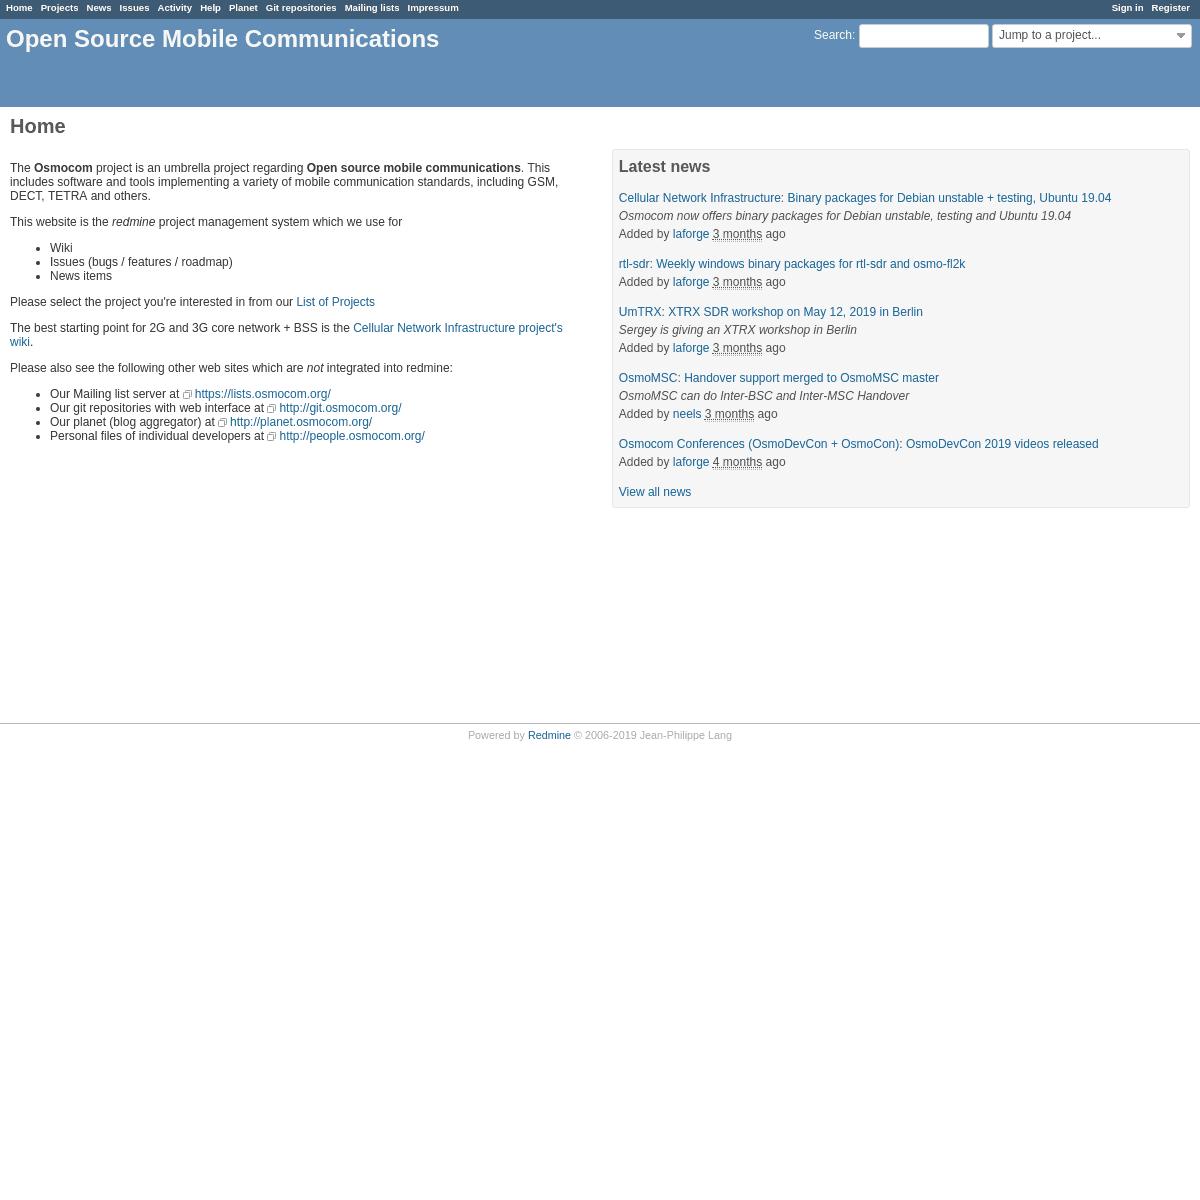 ArchiveBay.com - osmocom.org - Open Source Mobile Communications